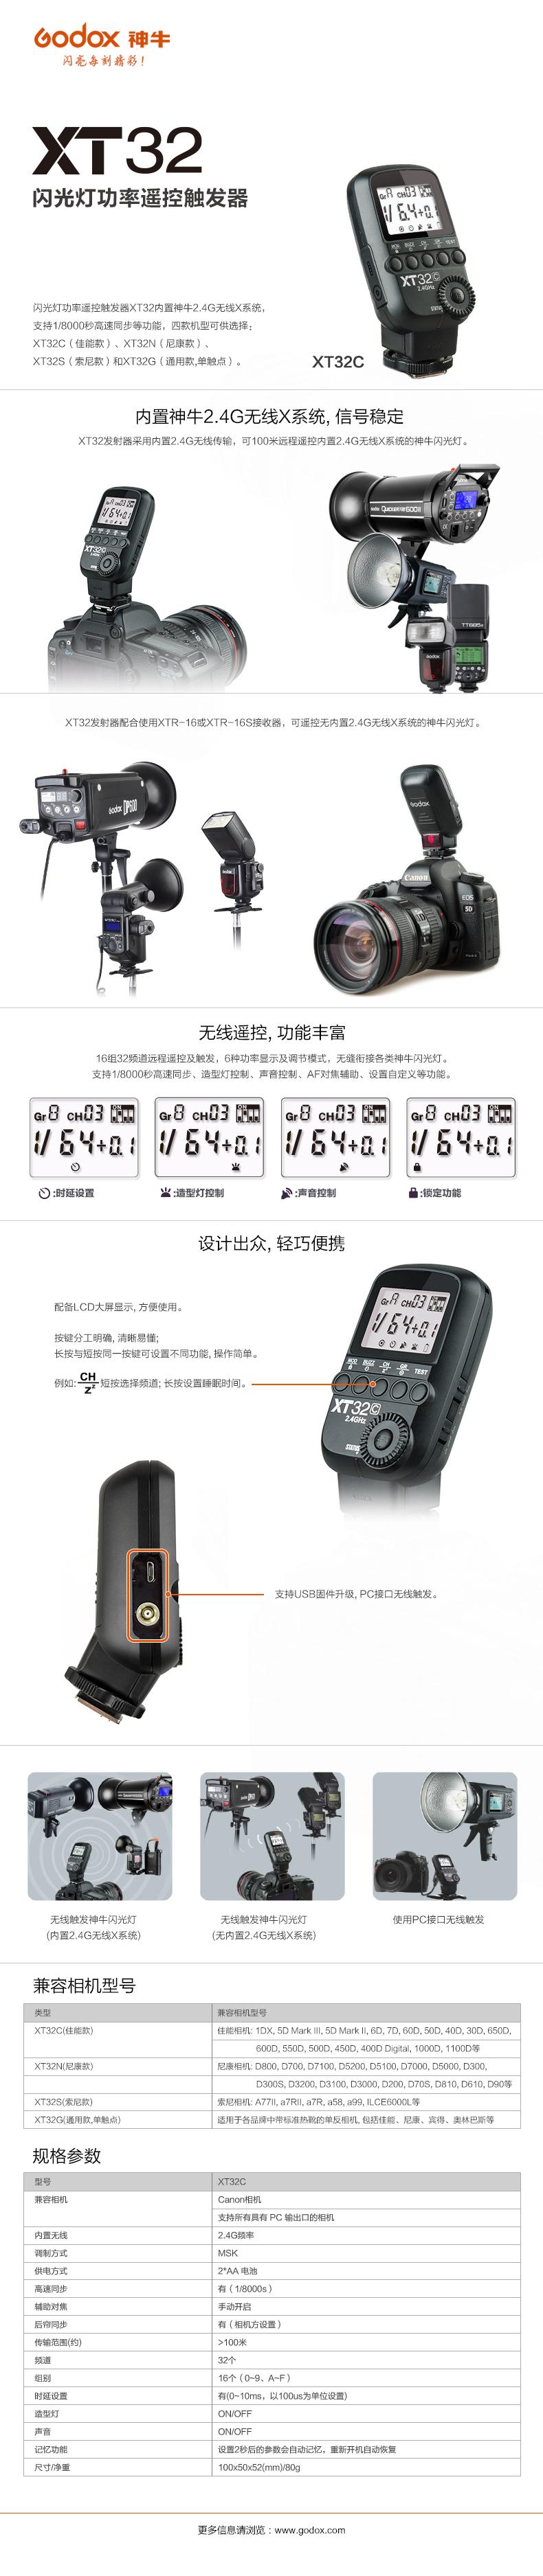 godox-xt32-spec-yingkee.jpg